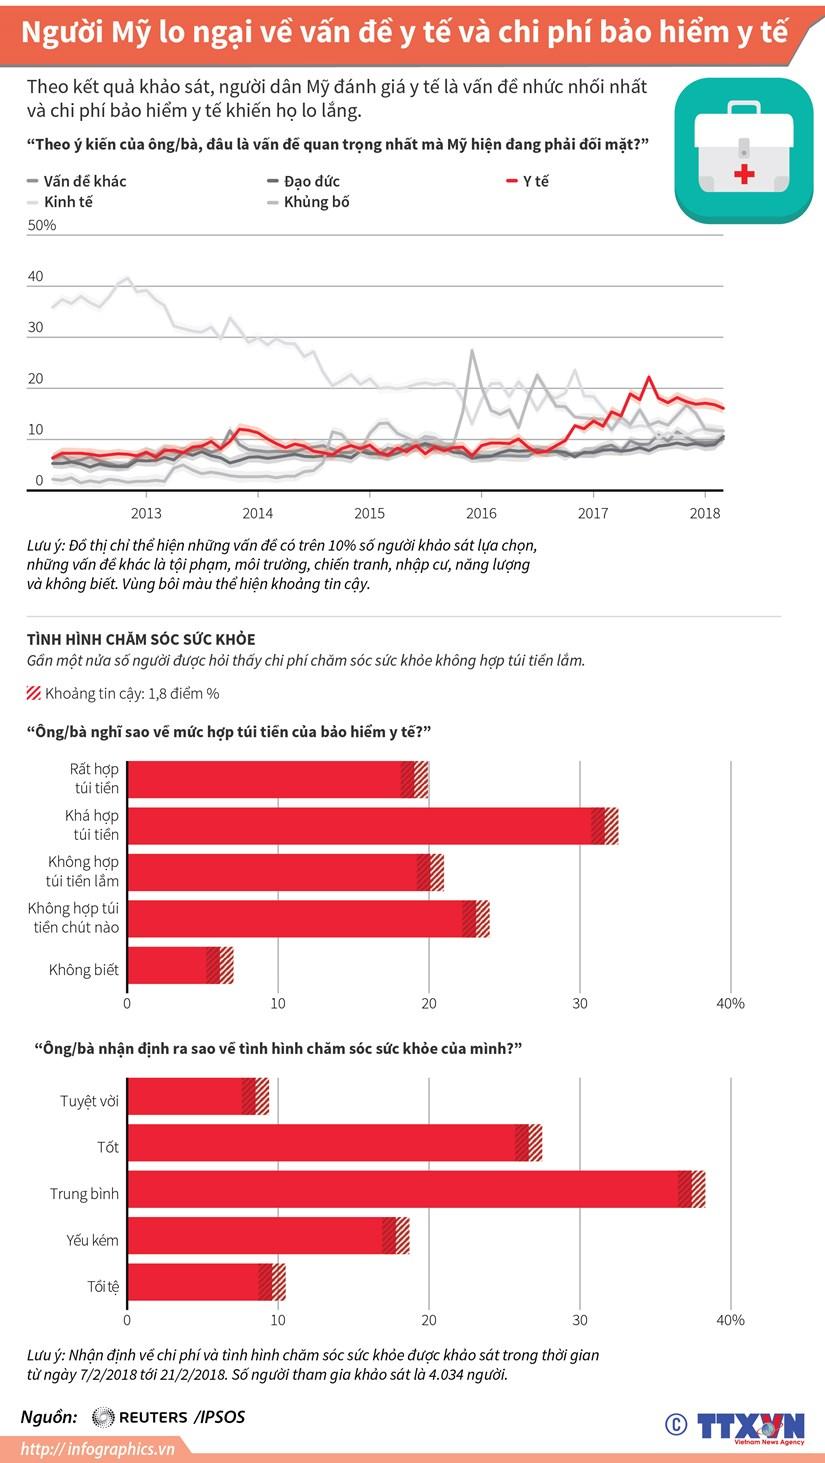 [Infographics] Nguoi My lo ngai ve y te va chi phi bao hiem y te hinh anh 1